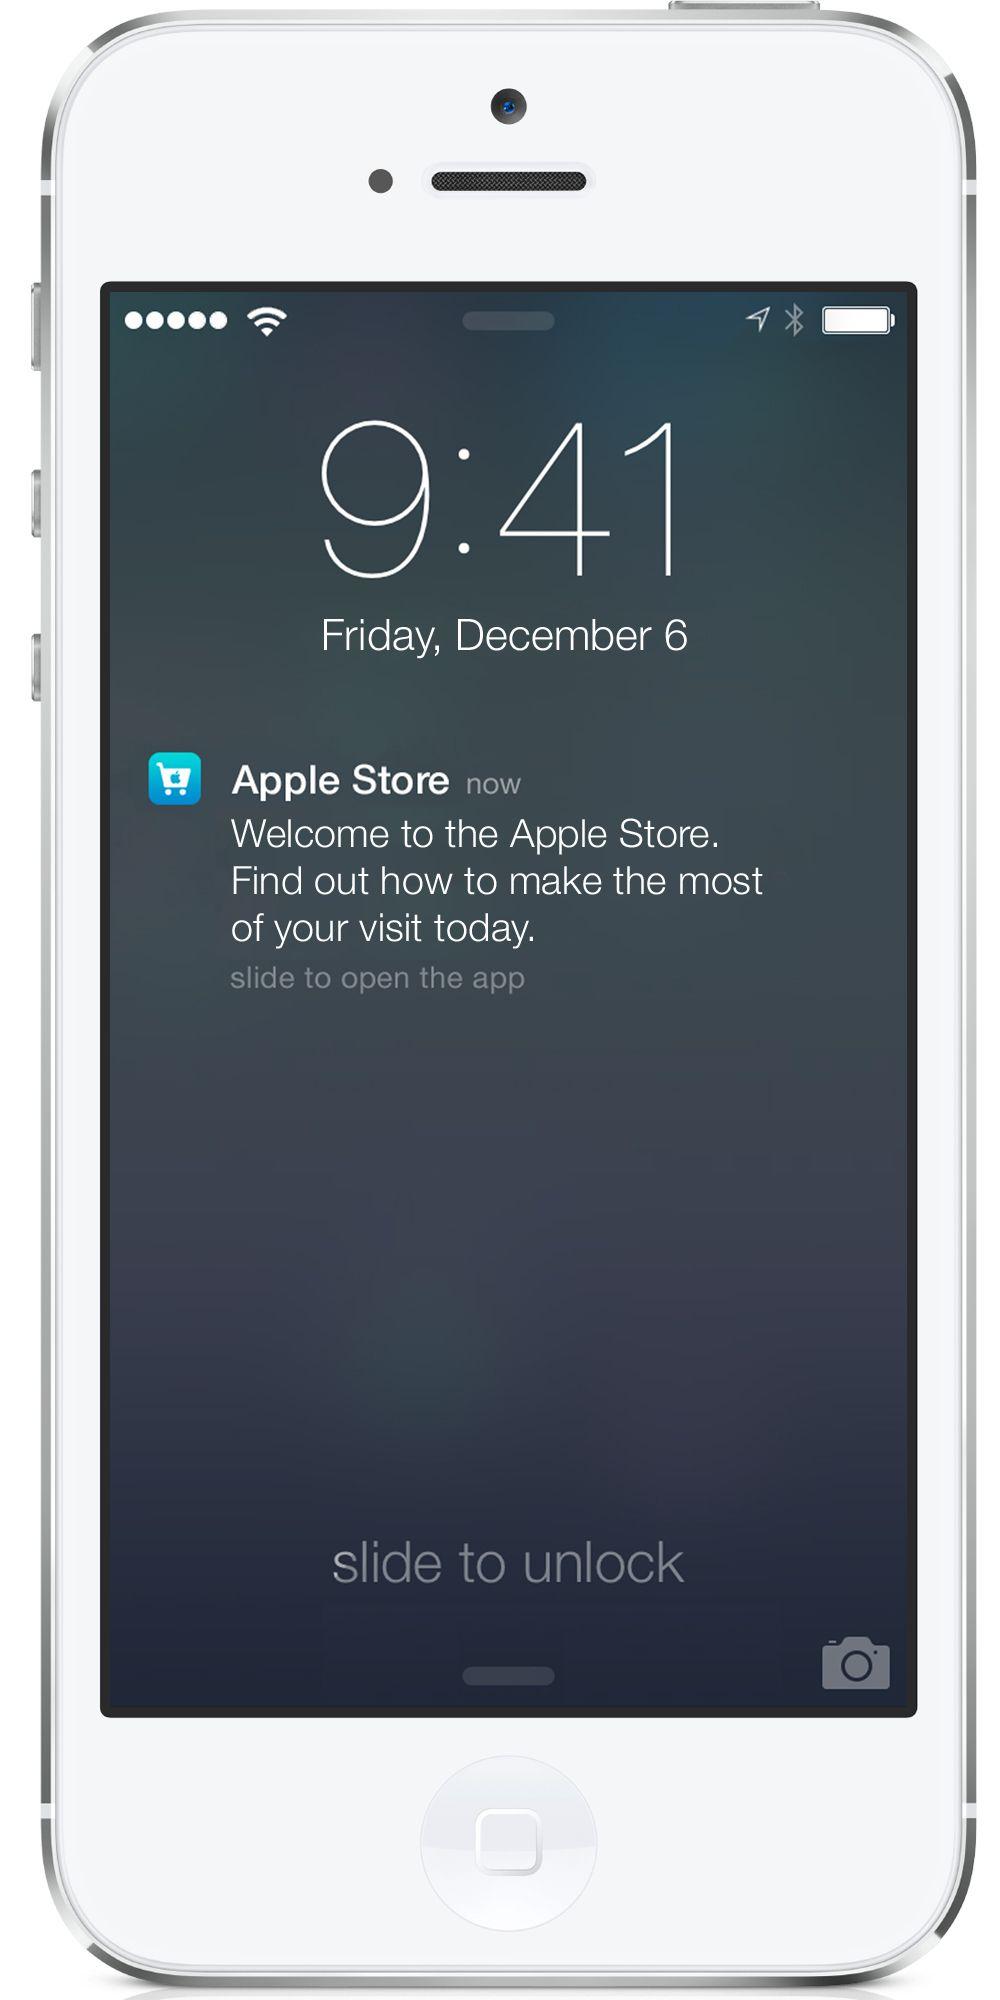 Apple-In-Store Location iBeacon